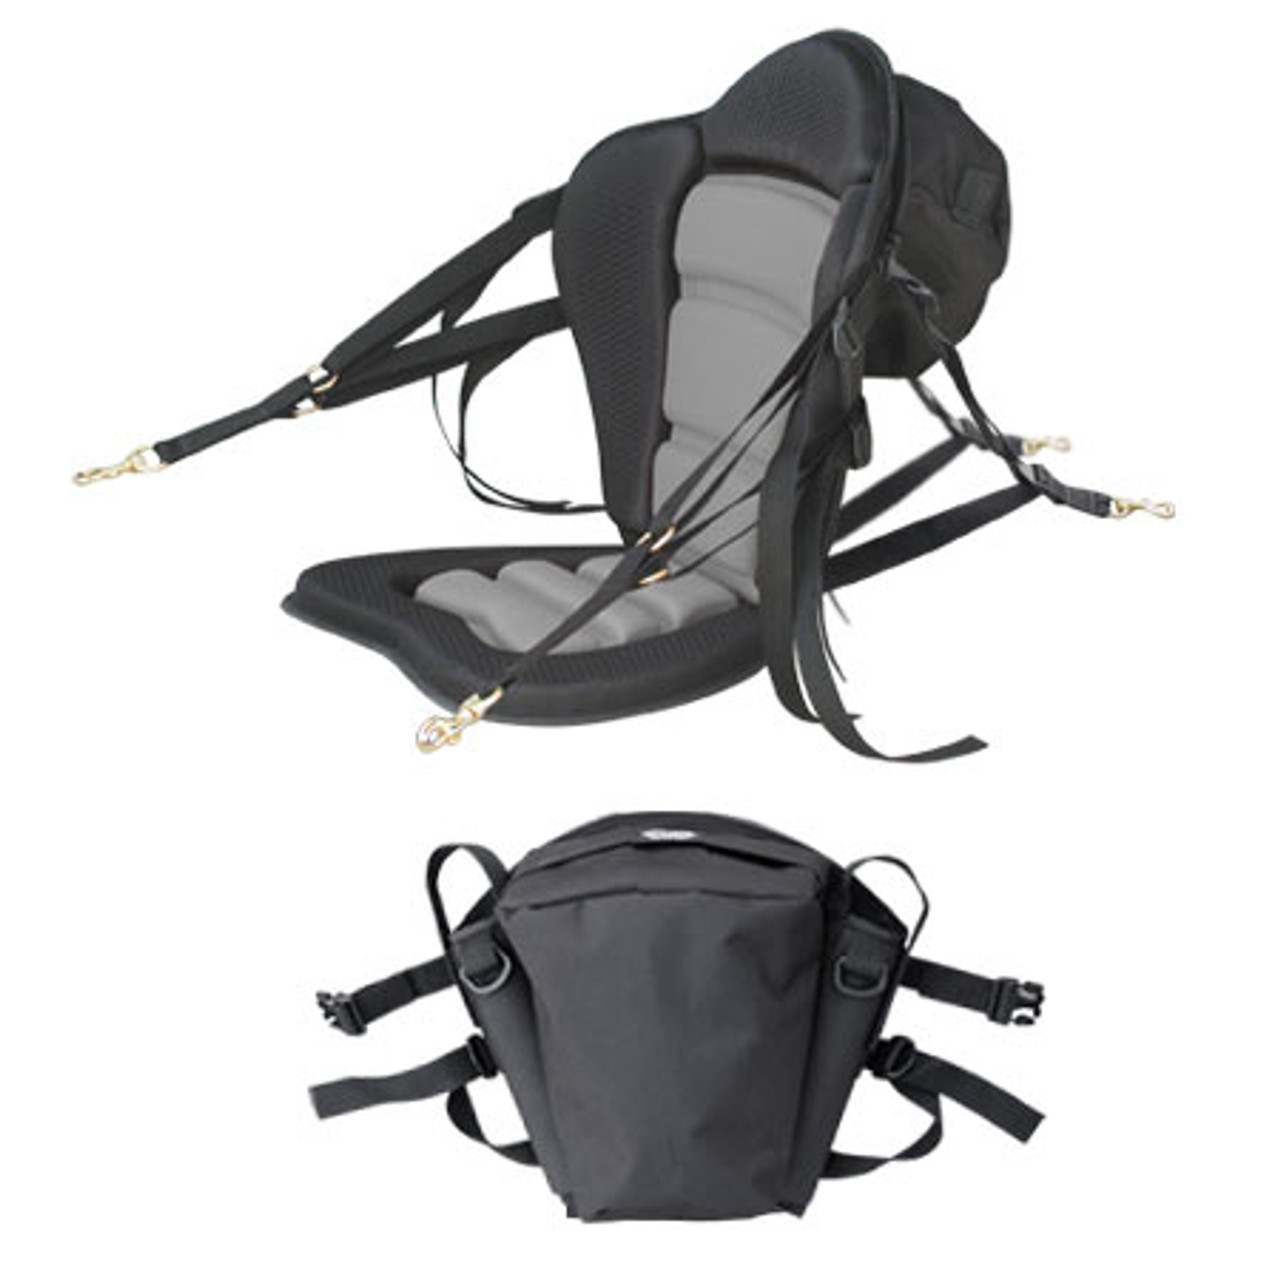 GTS Elite Molded Foam Kayak Seat - Fishing Pack